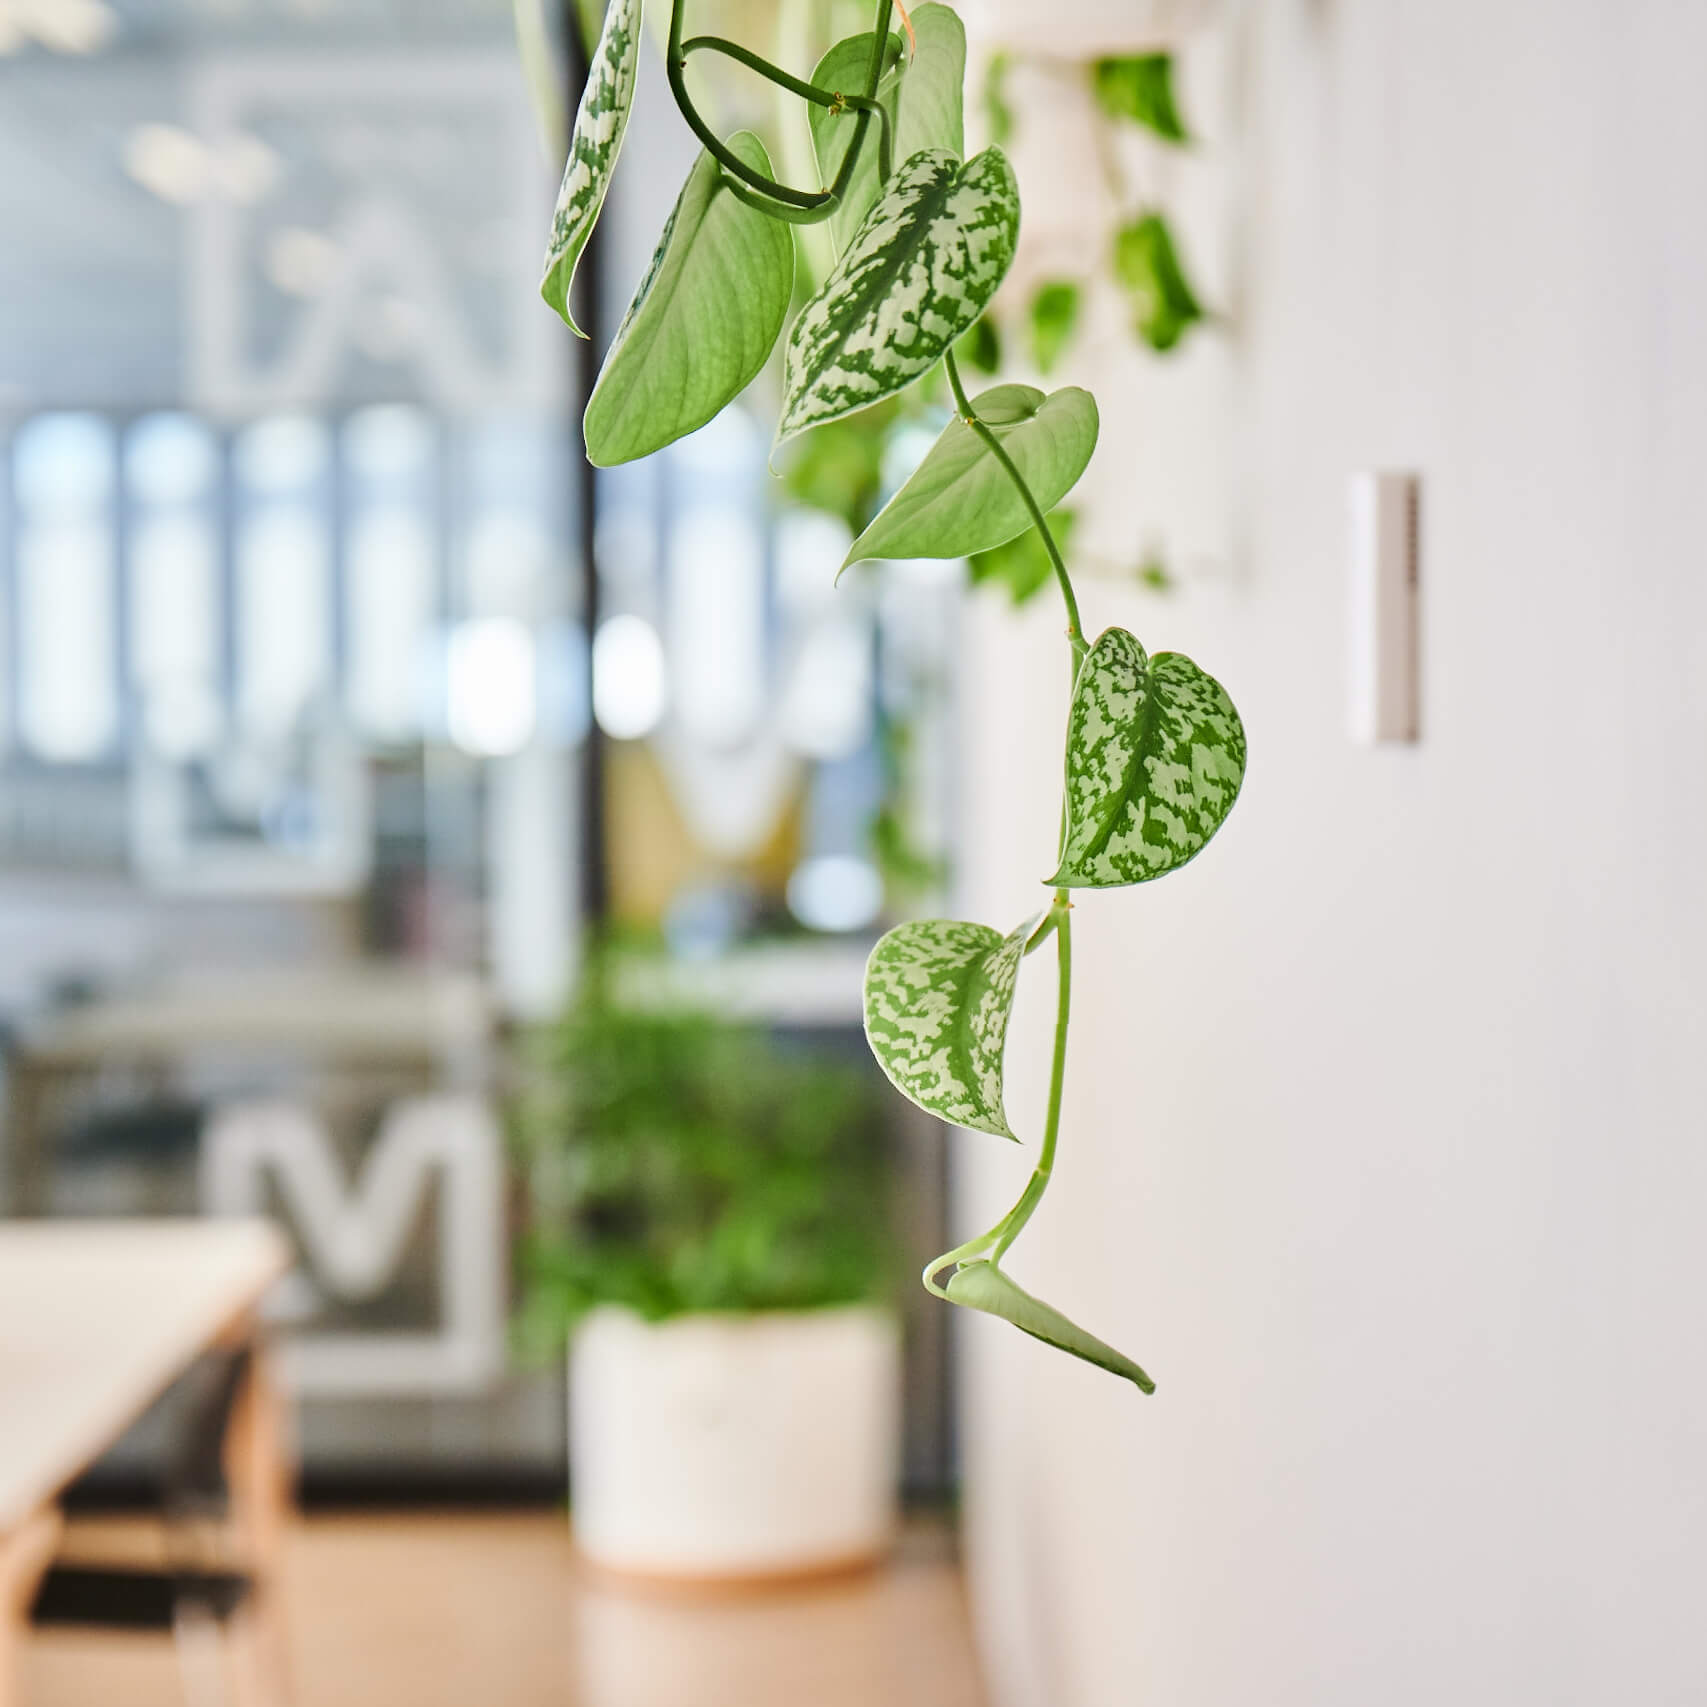 portfolio-offices-spaces-mitchellvranges-image6